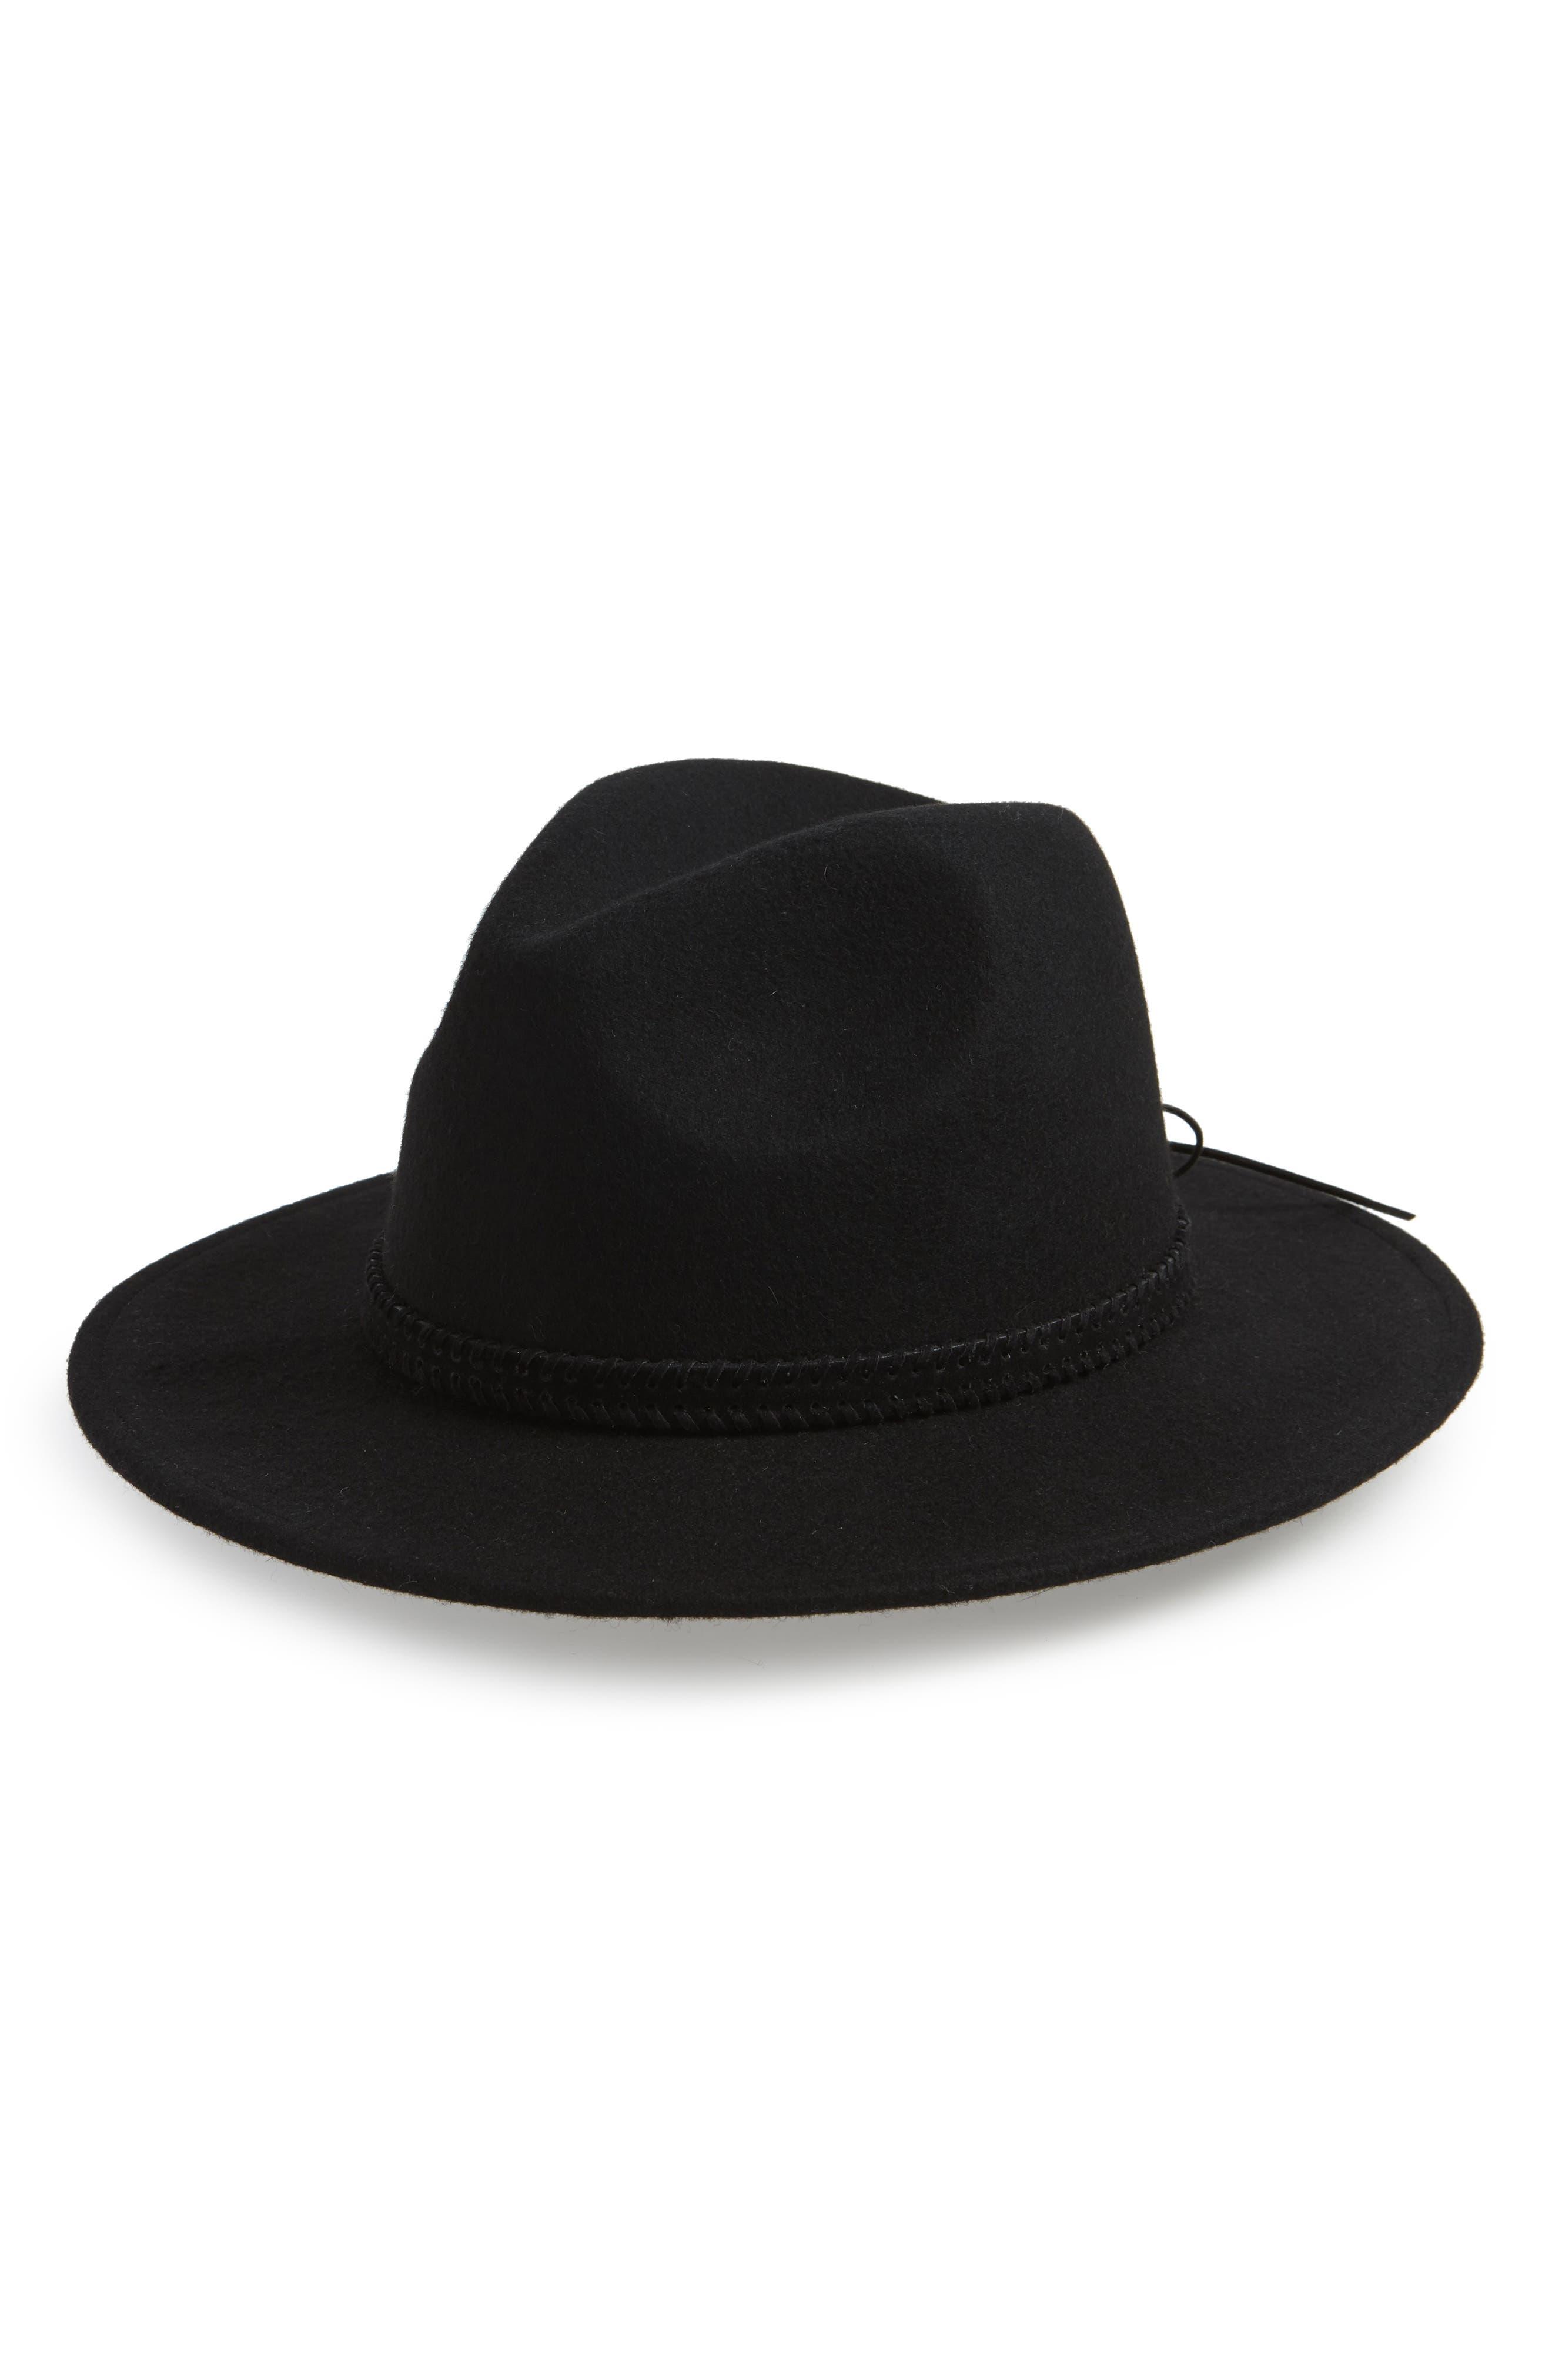 TREASURE & BOND Felt Panama Hat, Main, color, BLACK